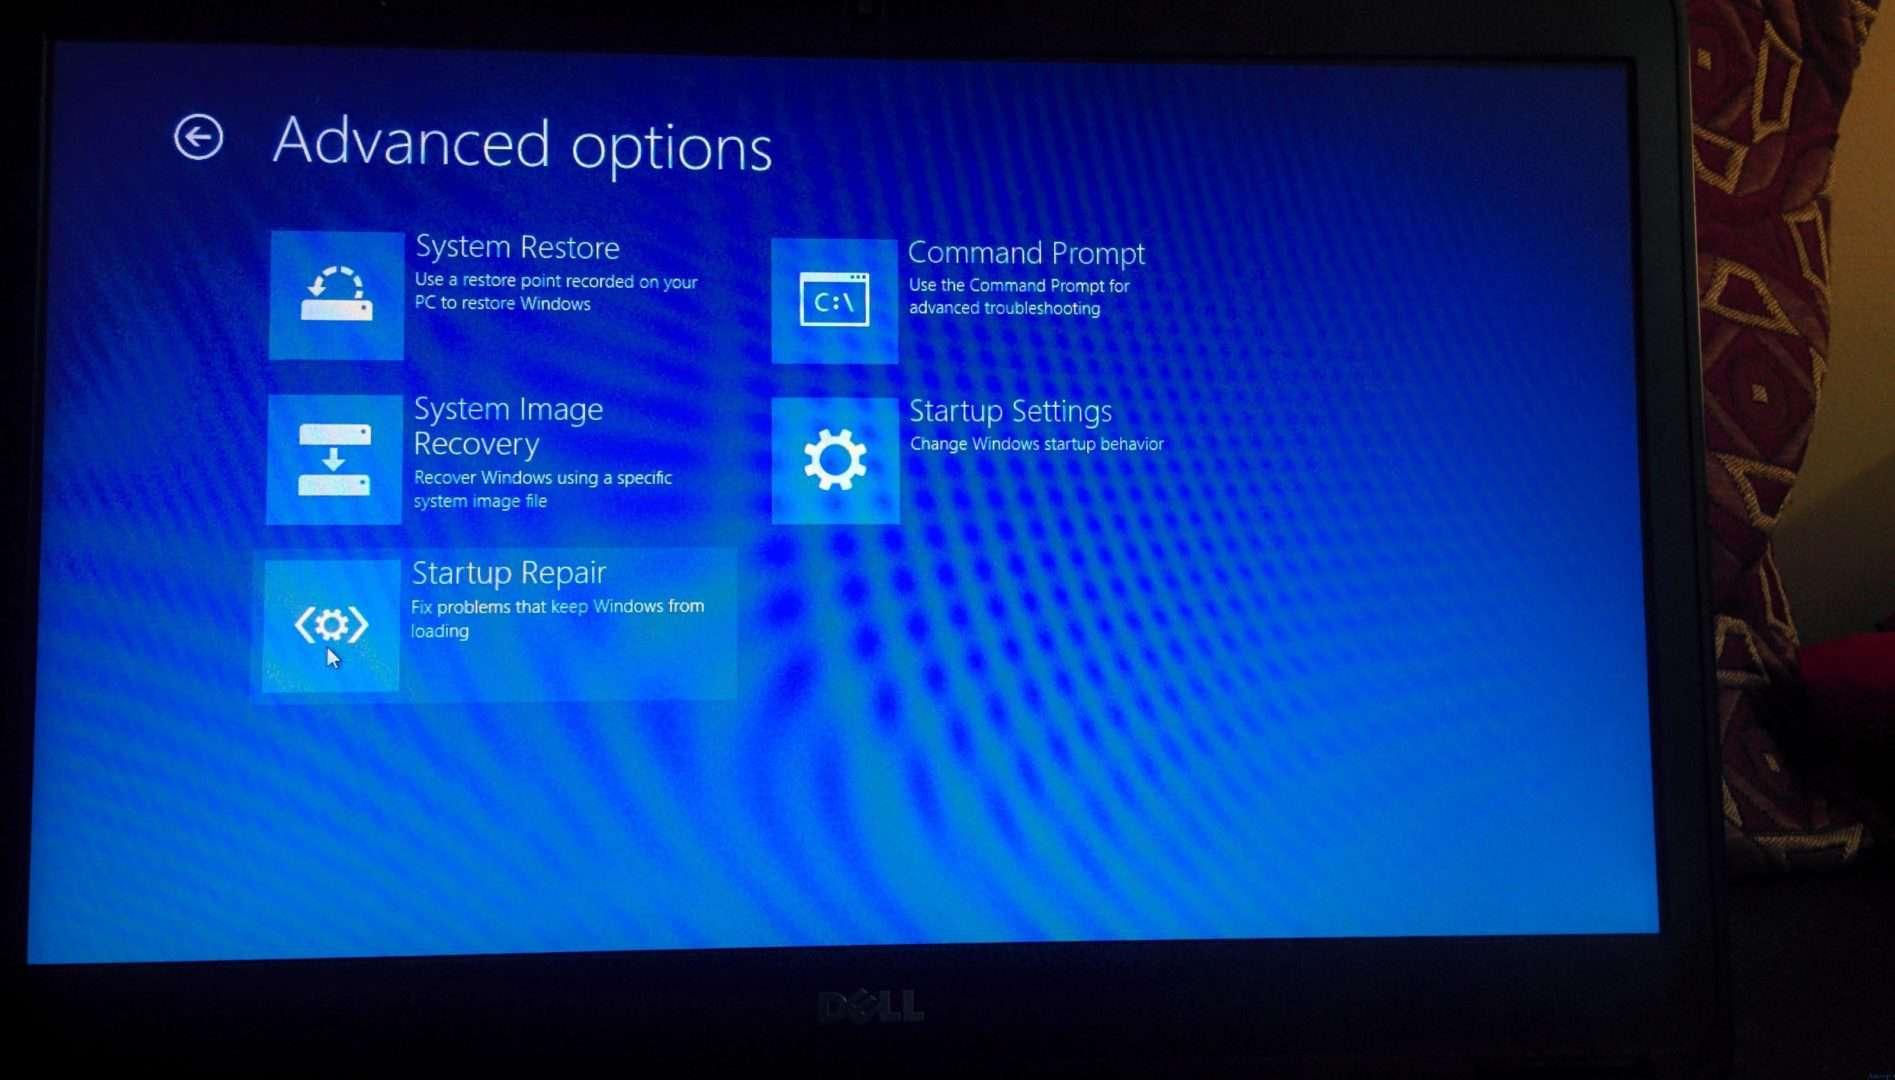 Windows 10 update driver/resolution problem - Microsoft Community